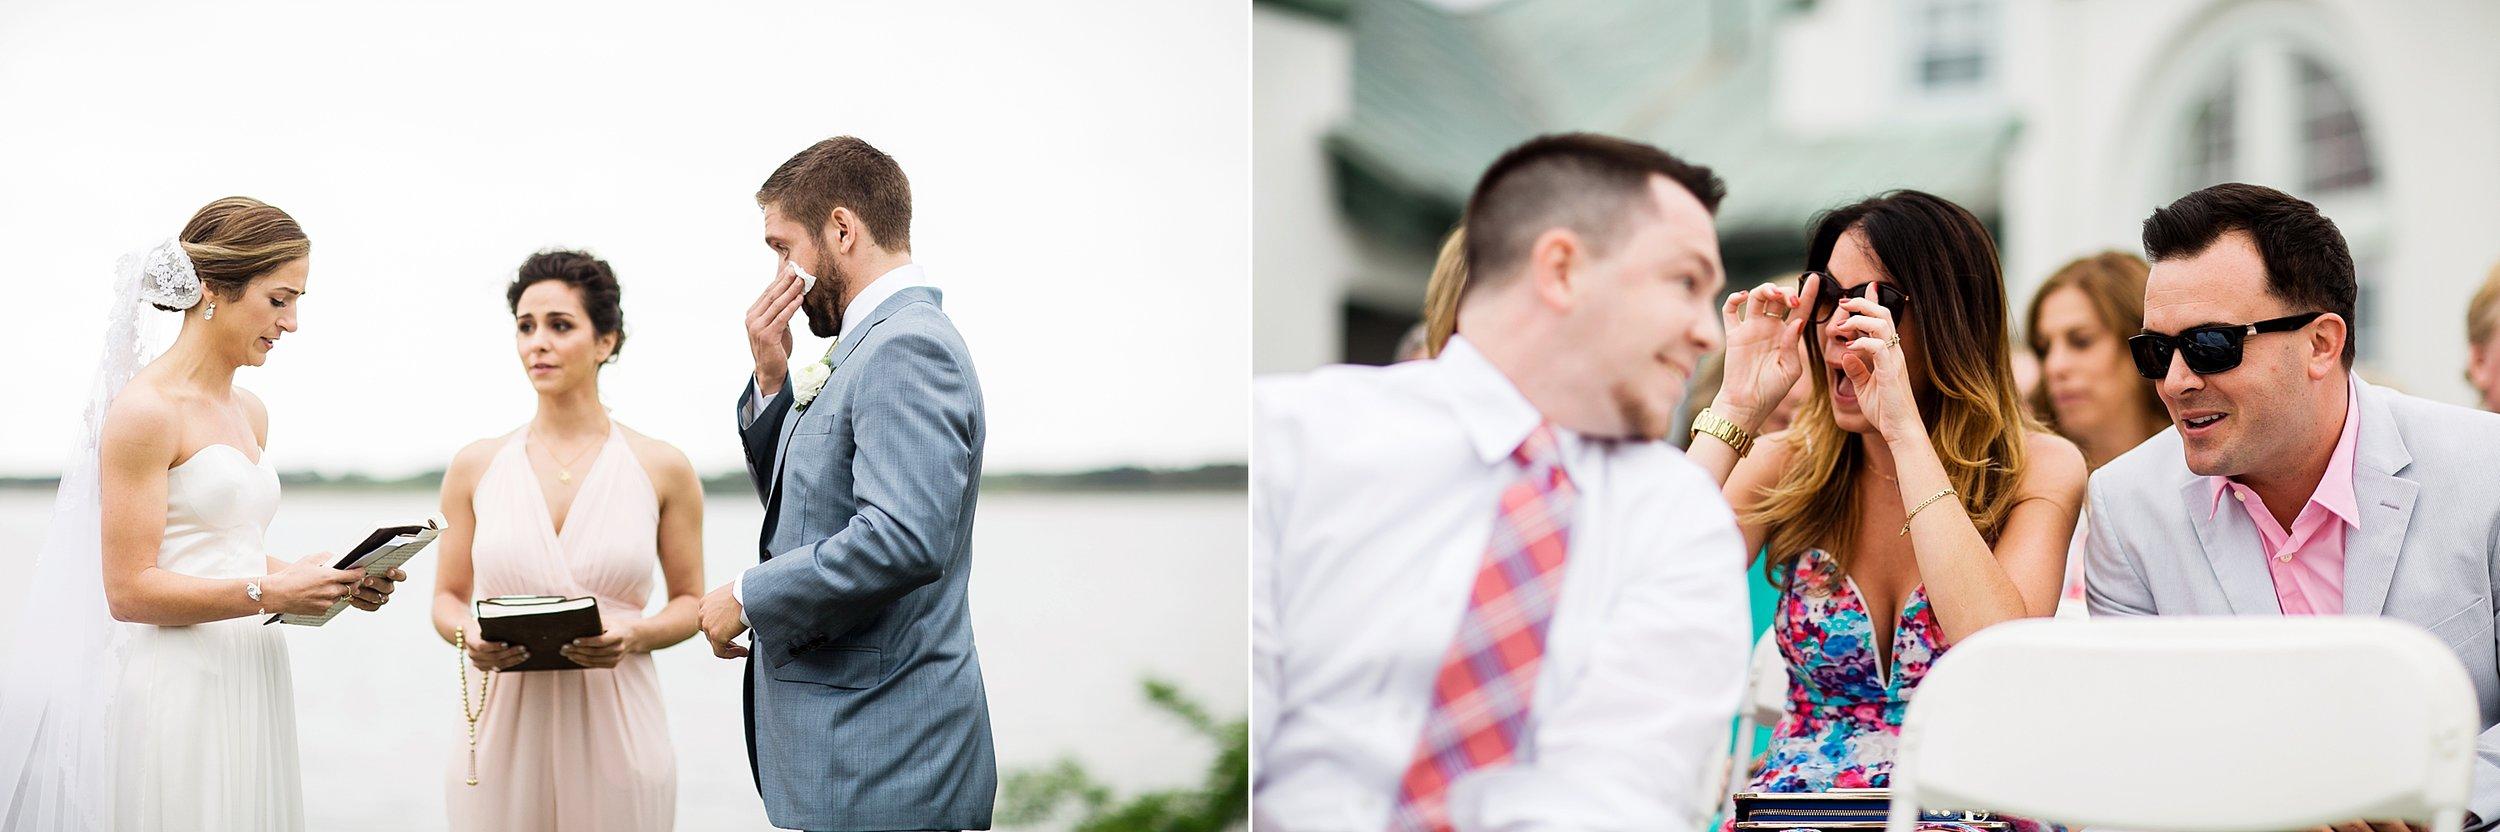 034 los angeles wedding photographer todd danforth photography cape cod.jpg